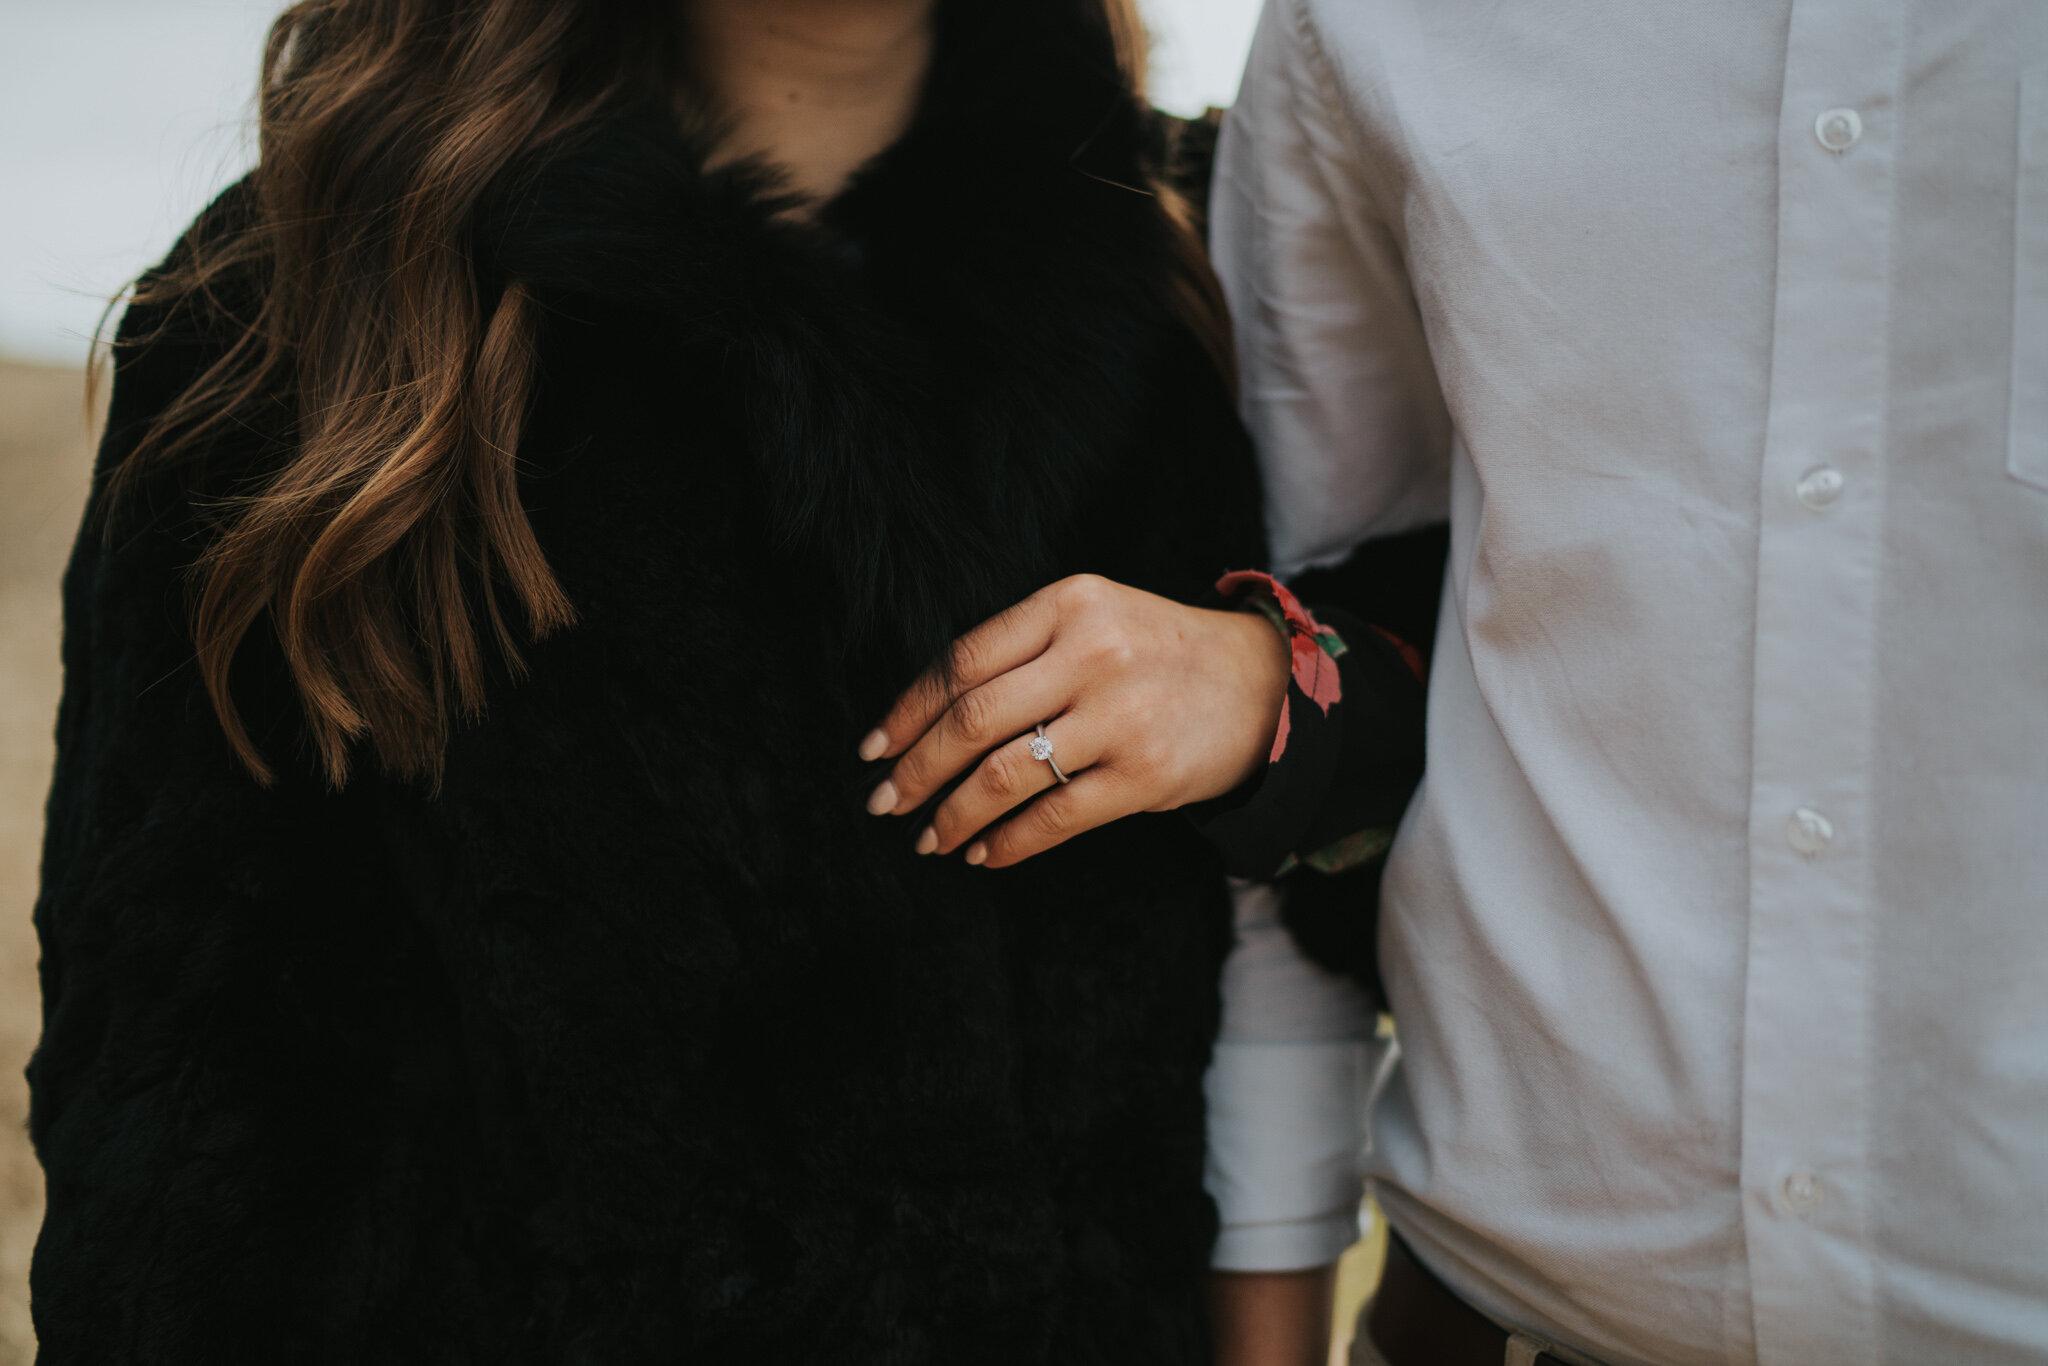 engagement-pre-wedding-hannah-michael-cudmore-grove-east-mersea-grace-elizabeth-colchester-essex-devon-suffolk-and-norfolk-alternative-wedding-and-family-photographer (26 of 51).jpg